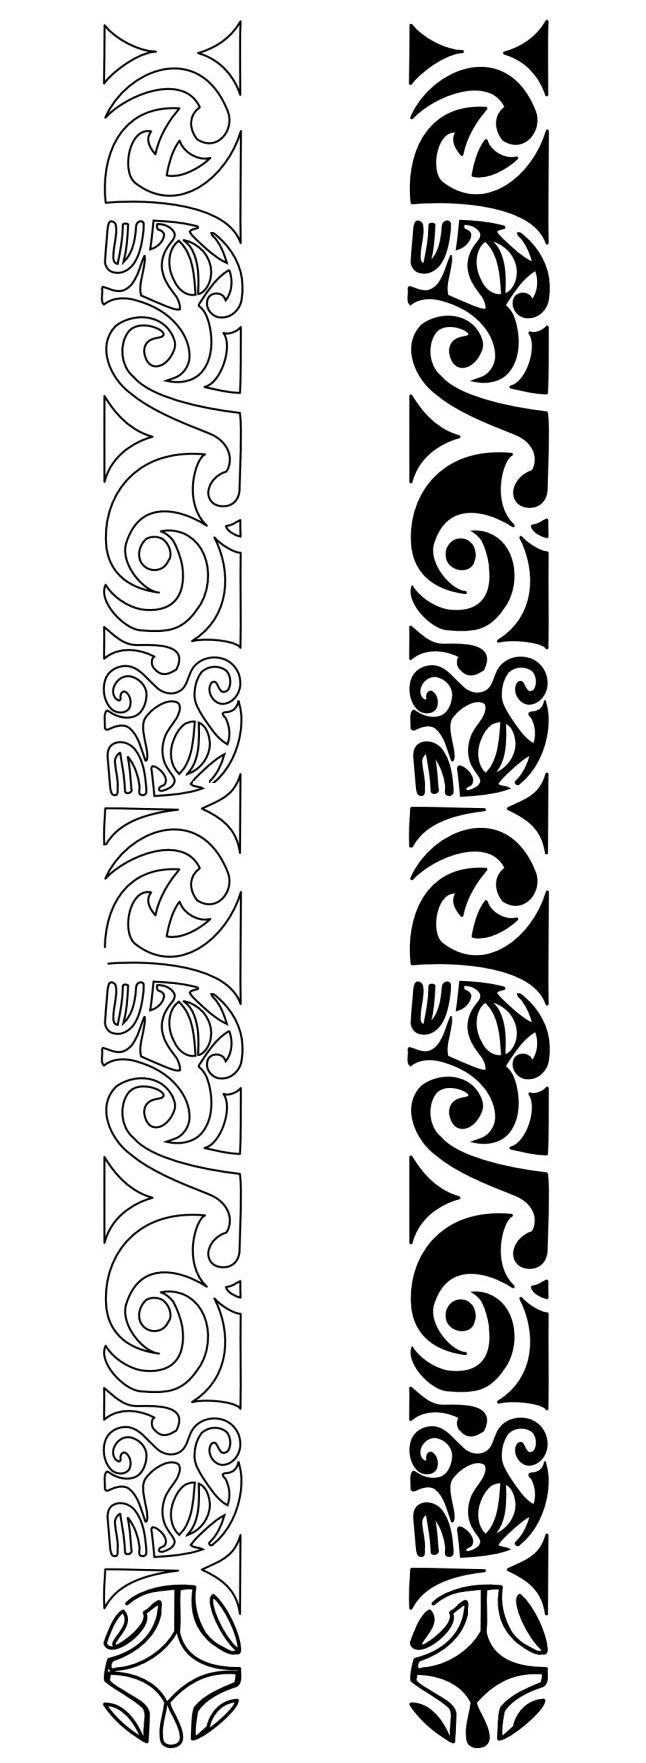 Bracelet Polynésien Tatouage à 409 best maori, pol images on pinterest | polynesian tattoos